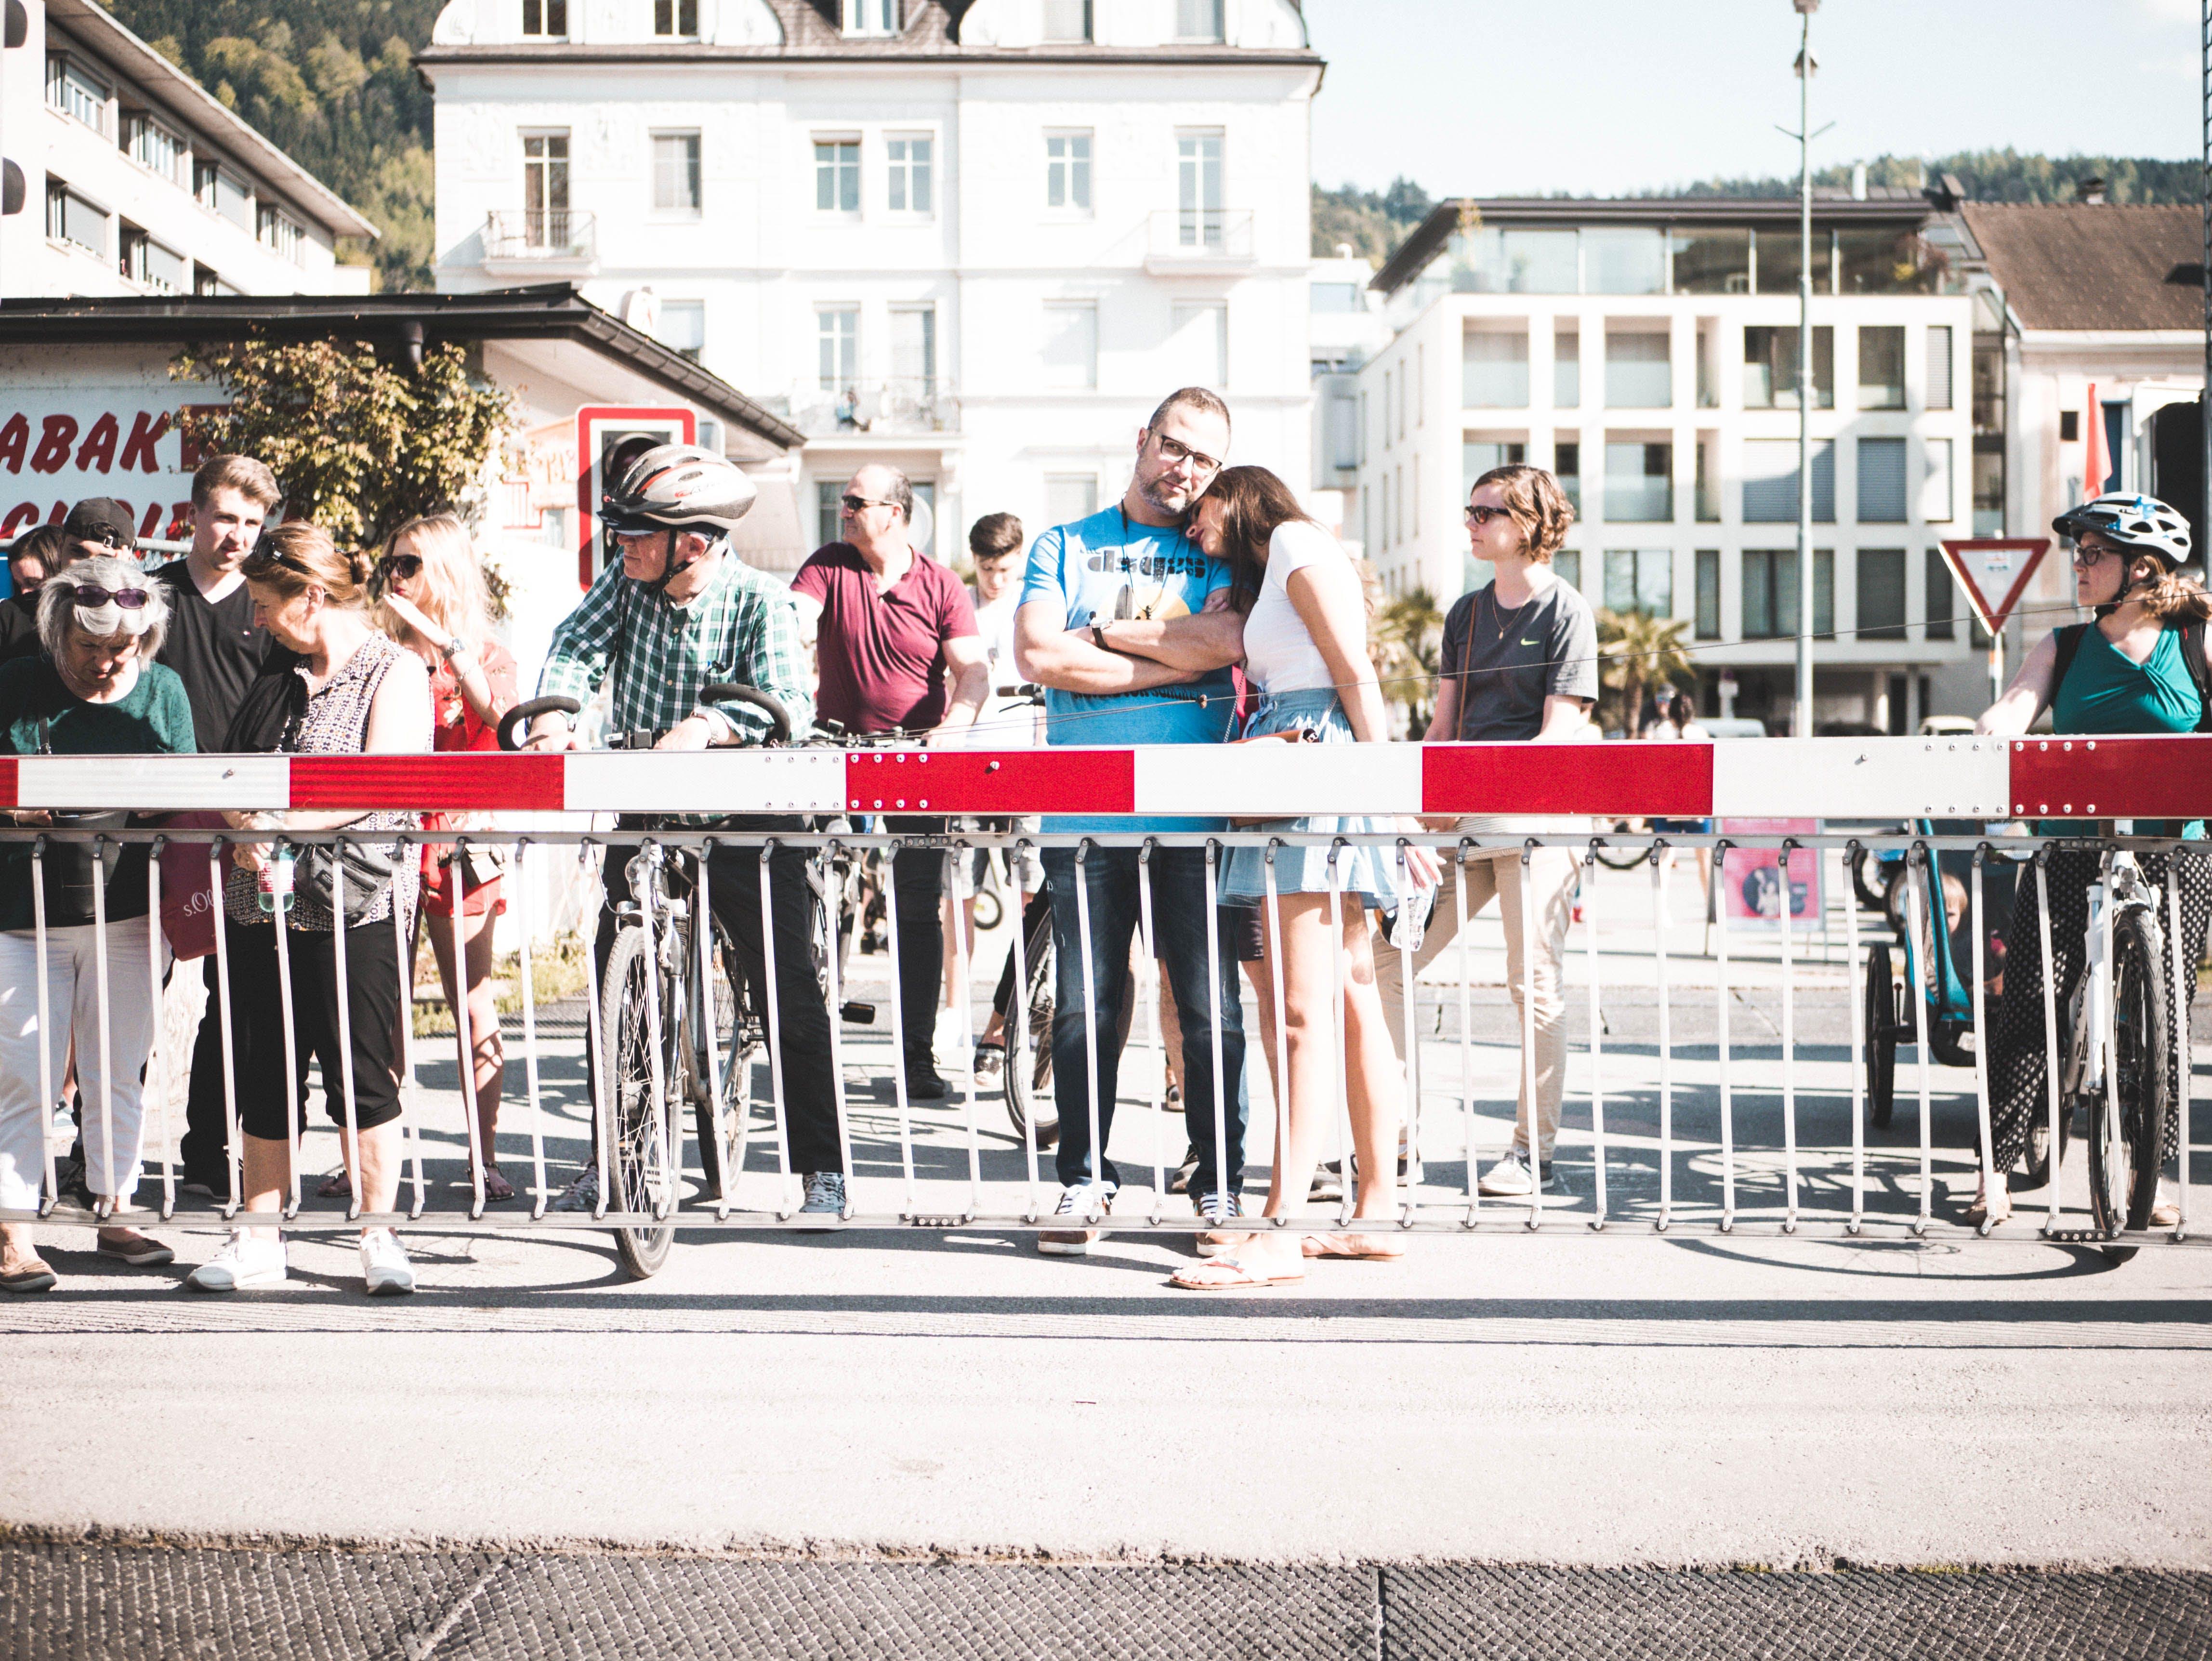 People Standing Near Handrail